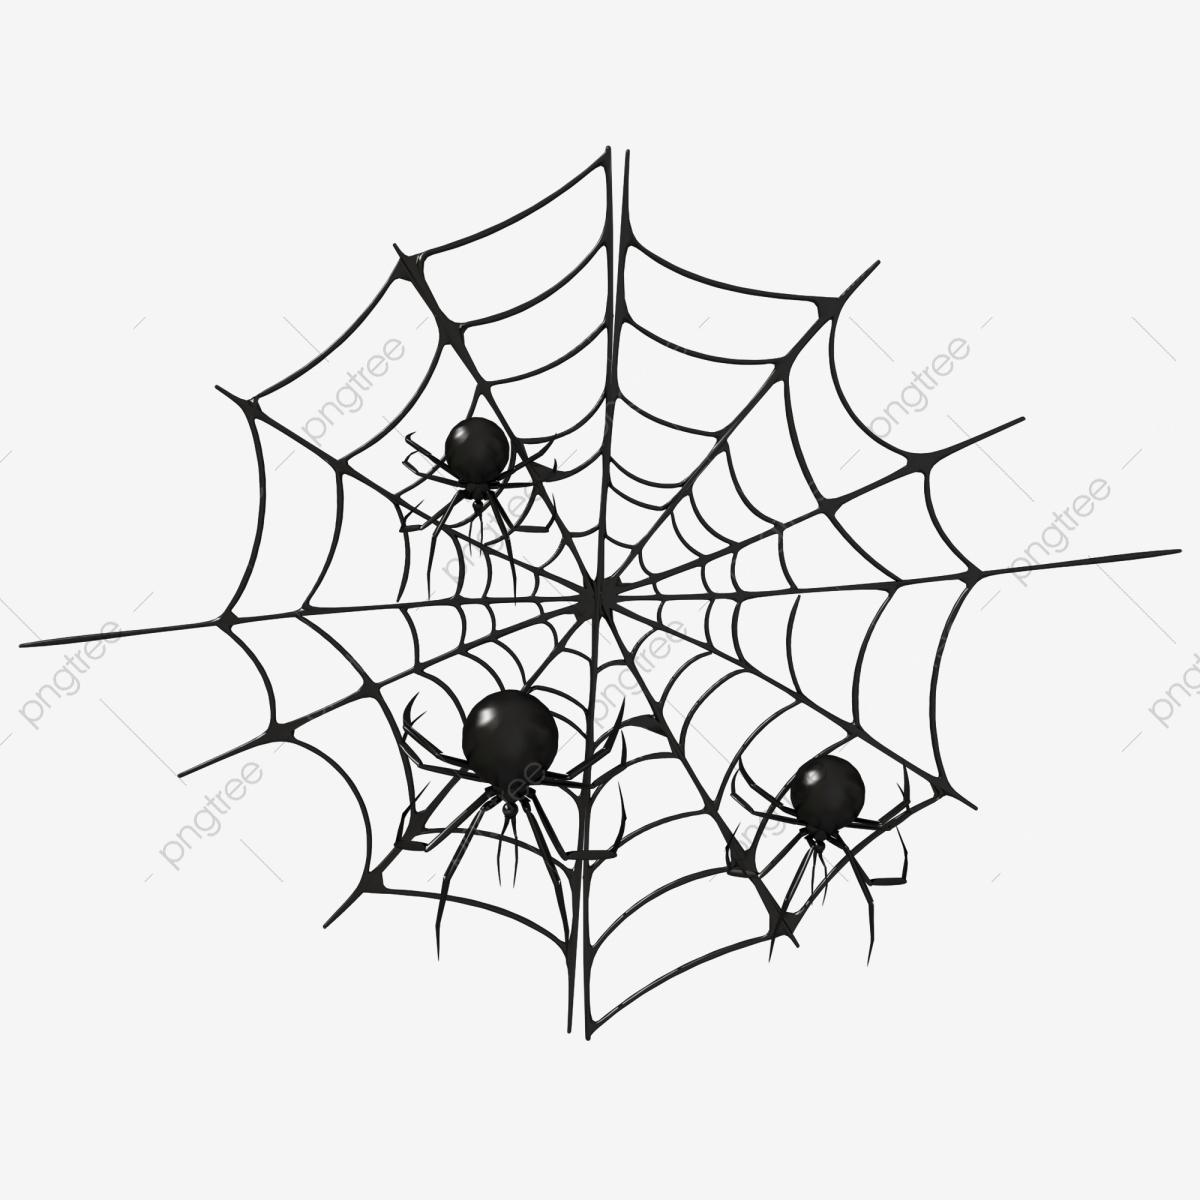 Halloween C4D Dessin Animé Toile Daraignée Noire, Araignée concernant Dessin Toile Araignée